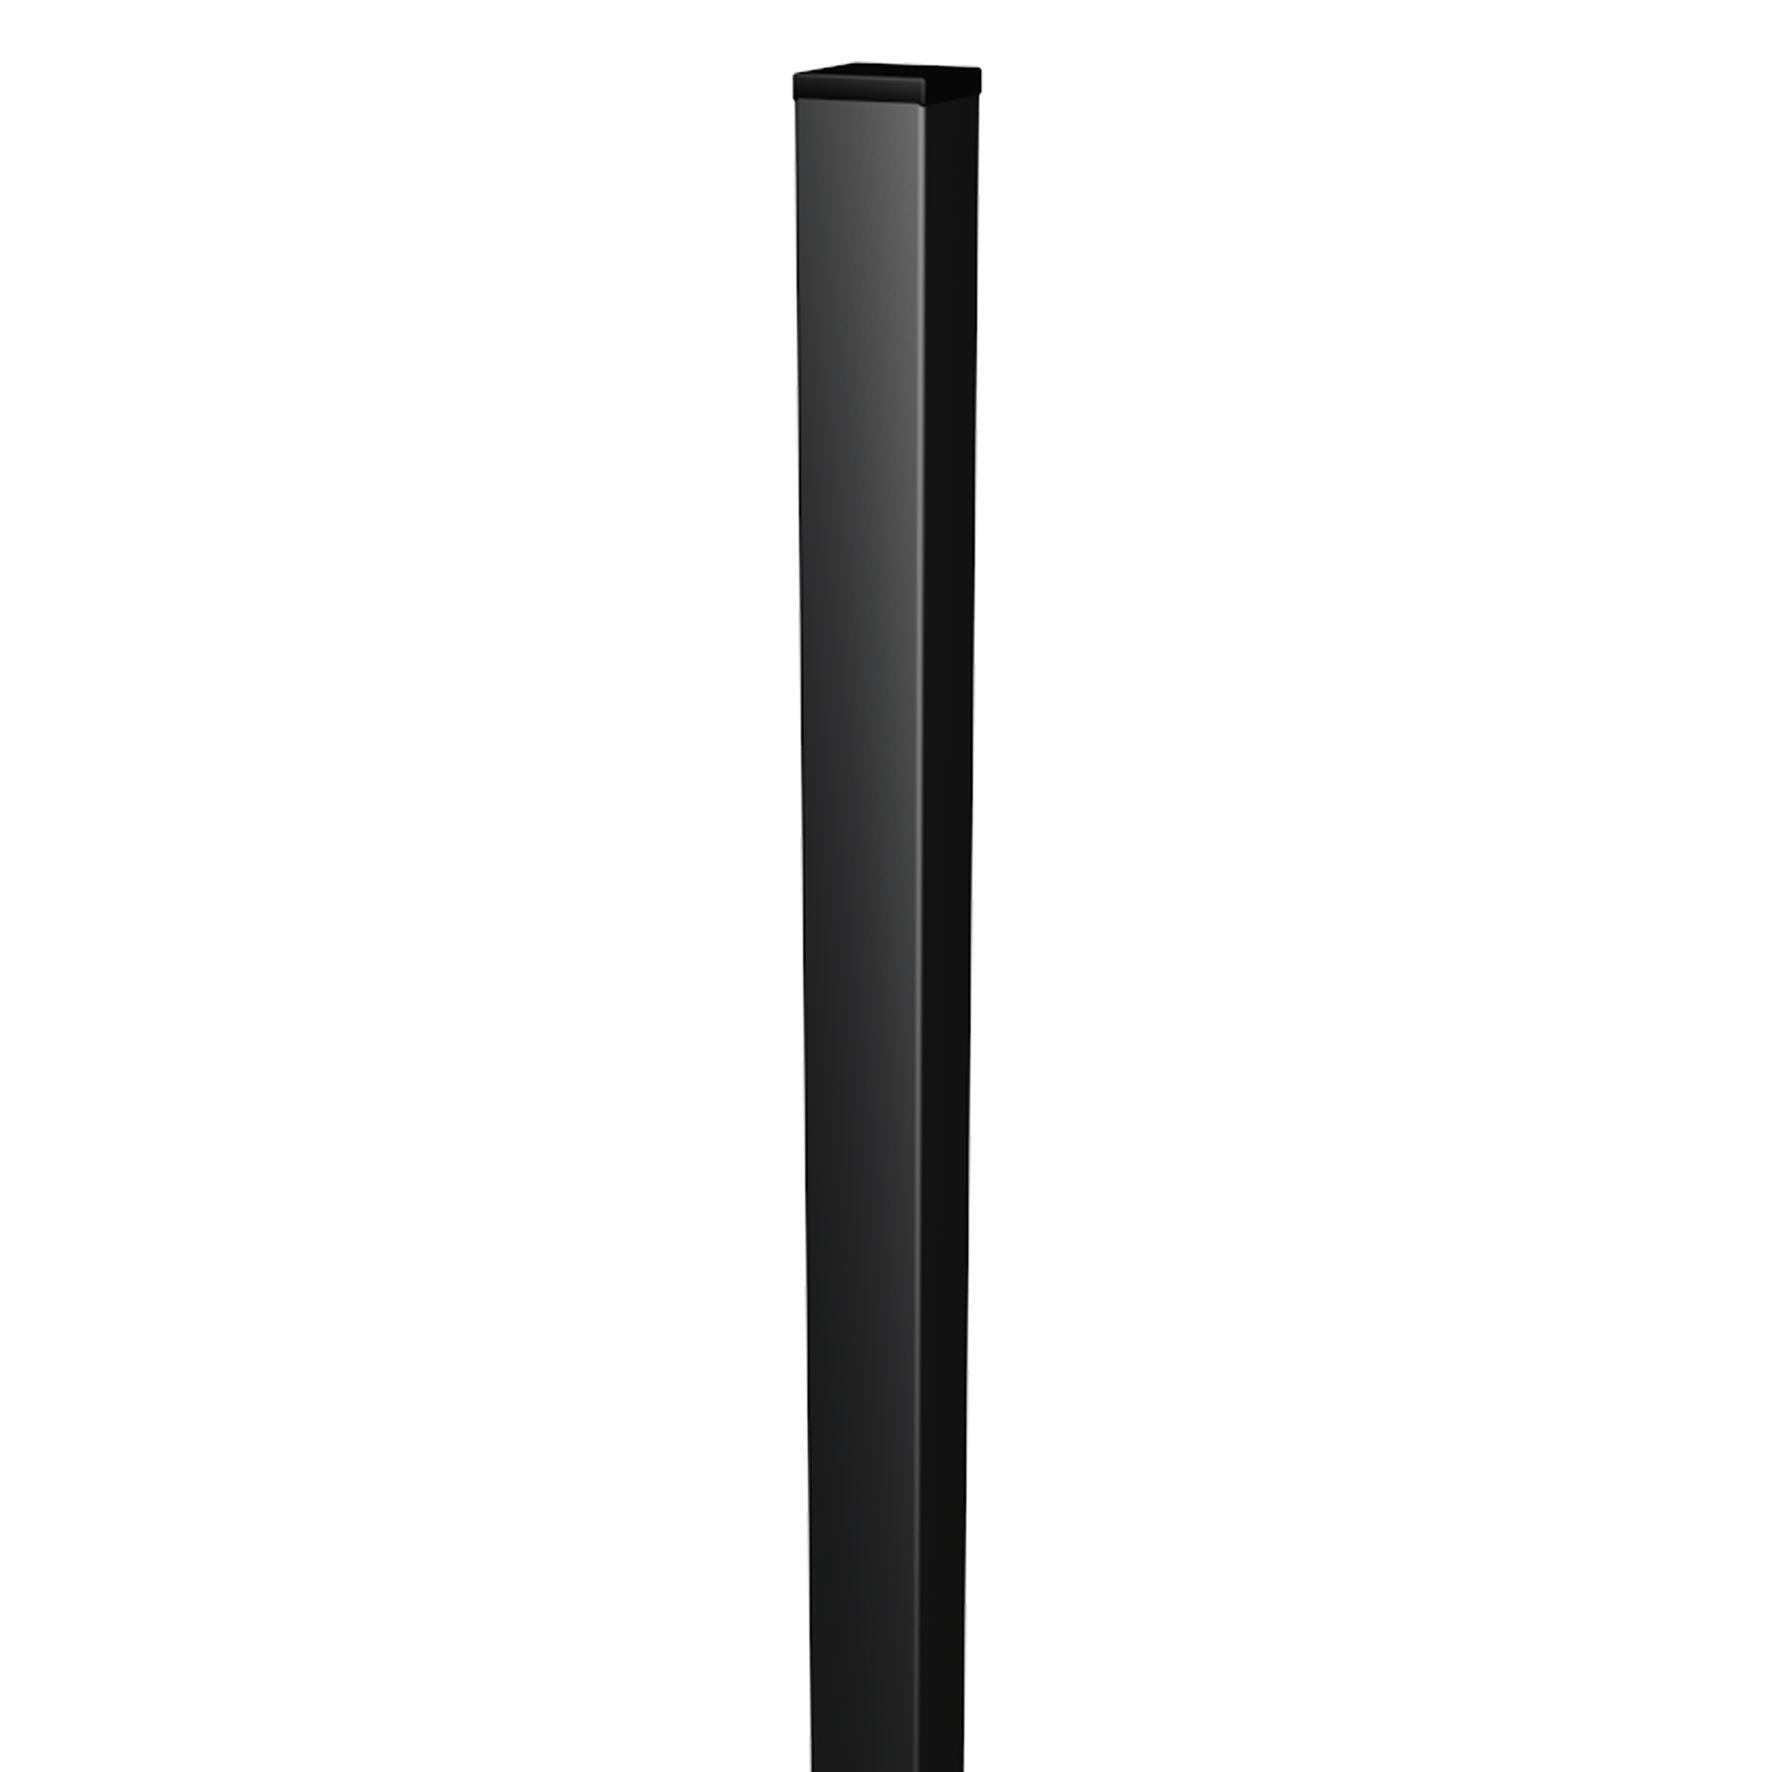 Palo in acciaio galvanizzato plastificato Medium quadrato H 150 cm L 5 x 5 cm